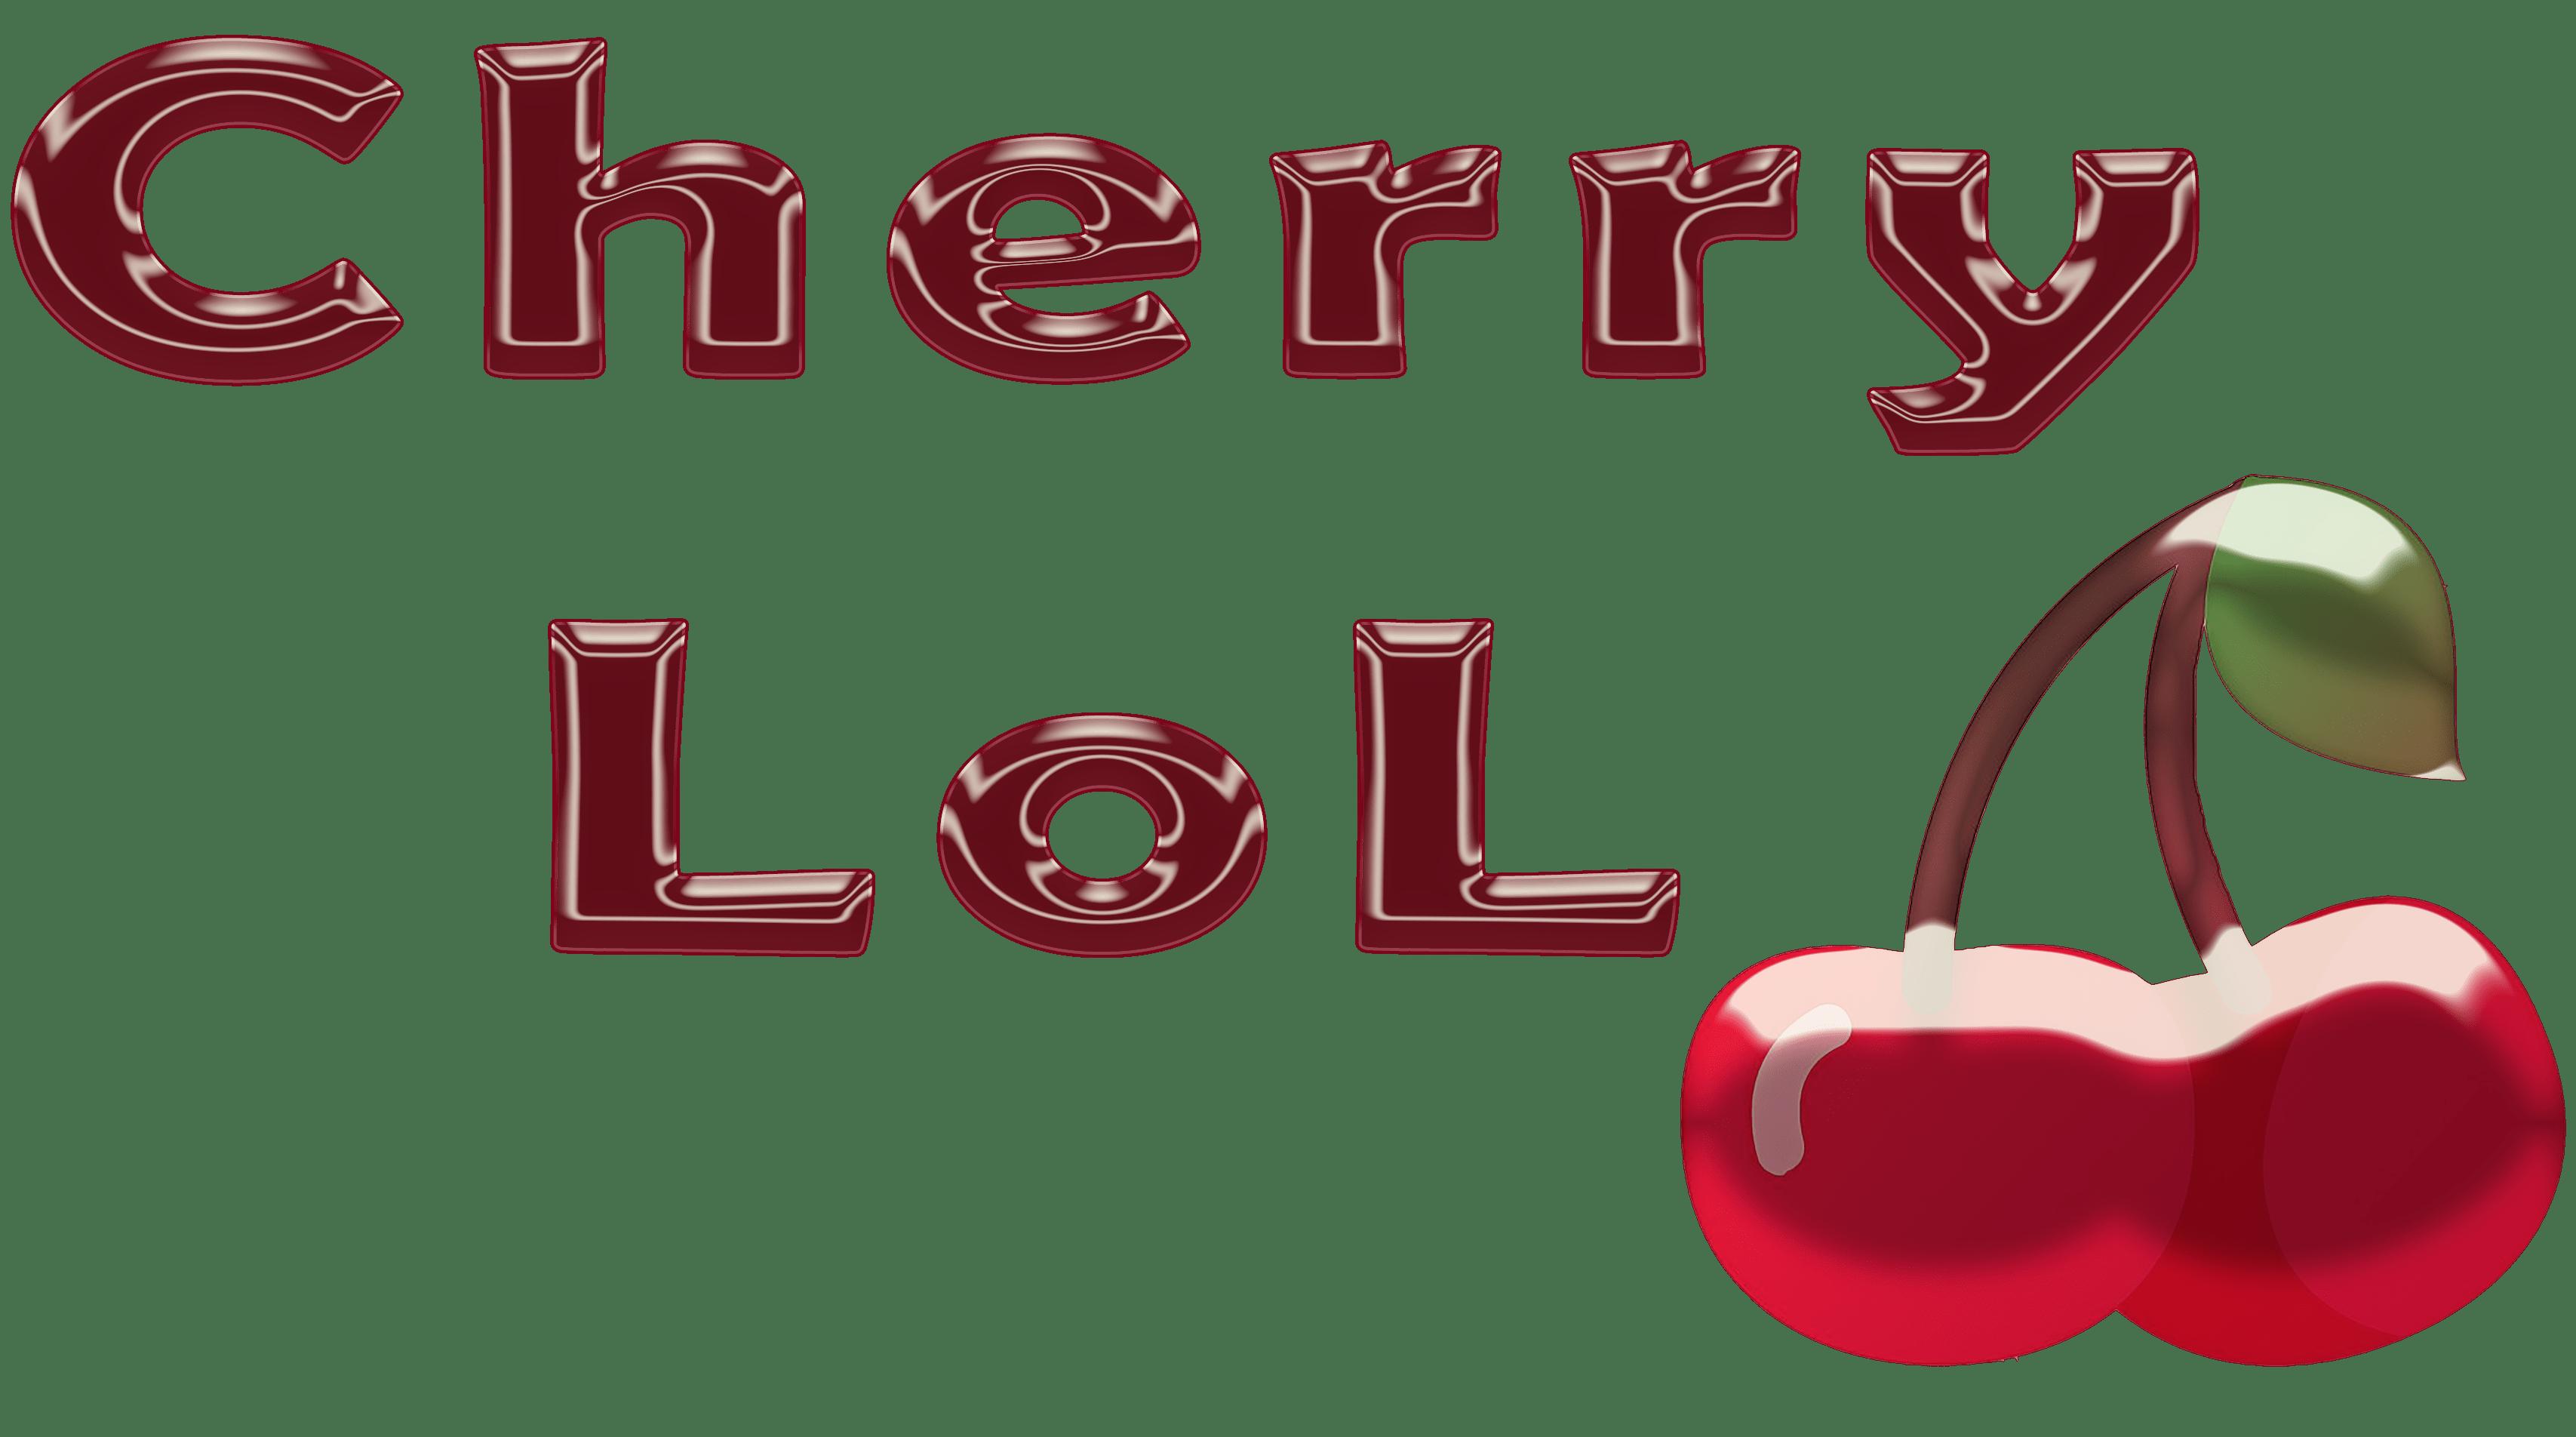 CherryLoL